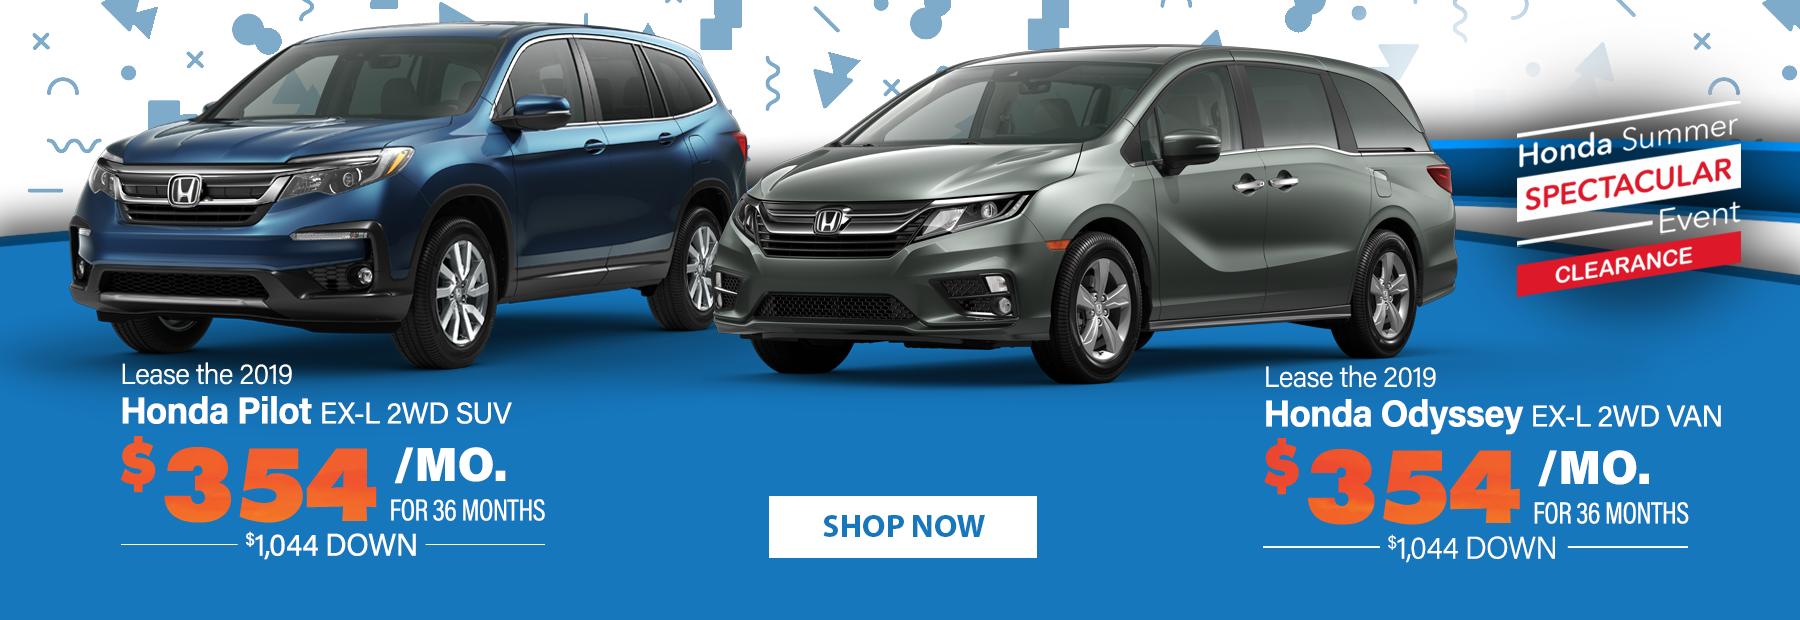 Honda Dealership Louisville Ky >> Performance Honda New Honda Sales Service Route 4 In Fairfield Oh